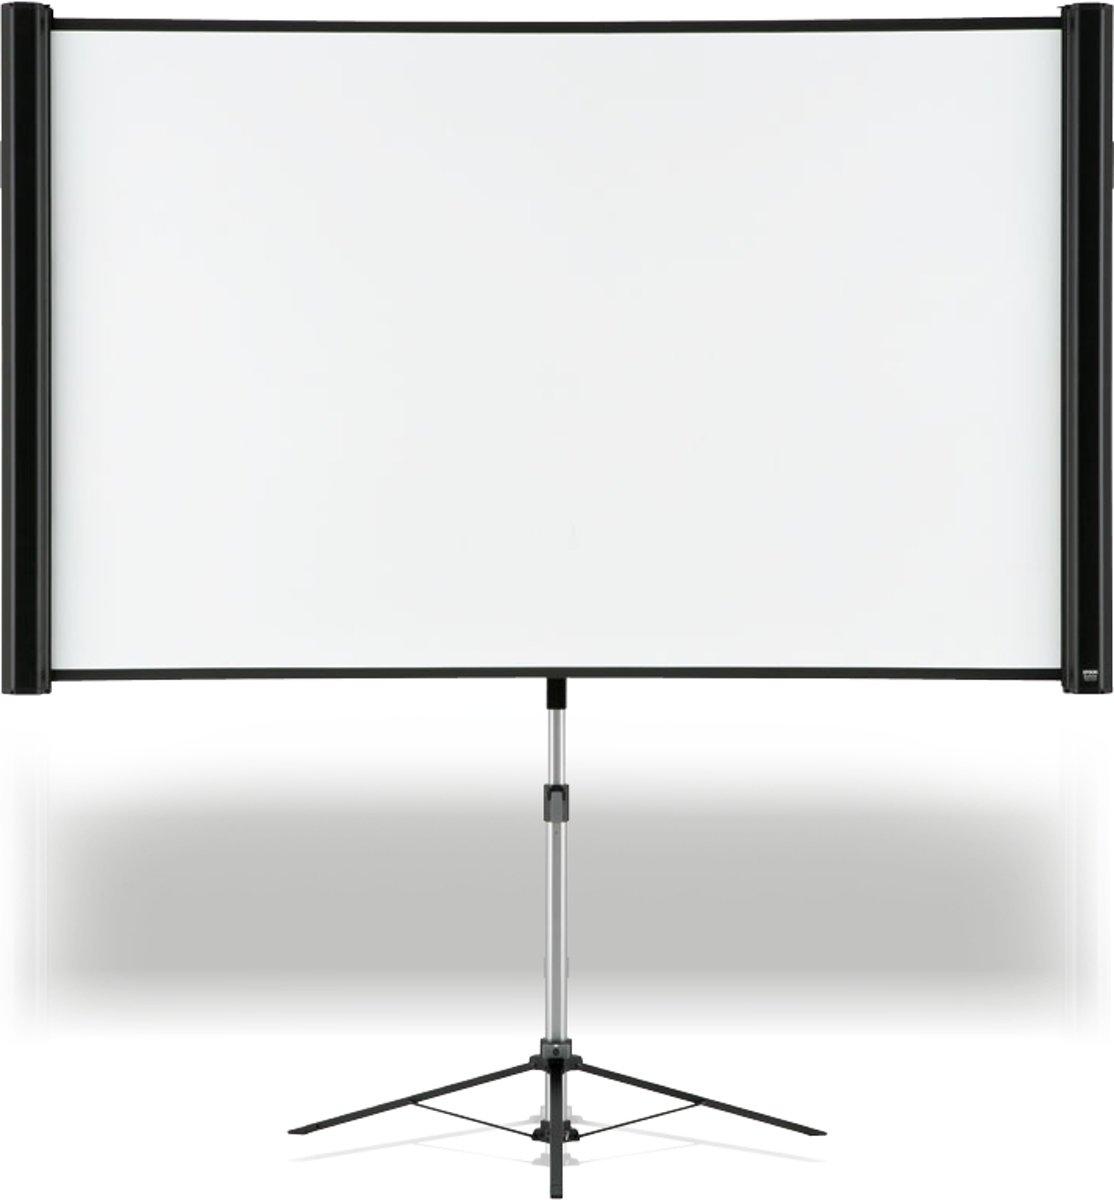 Silk Screen Multi-Aspect. 65i/74i/80i (ELPSC26) kopen